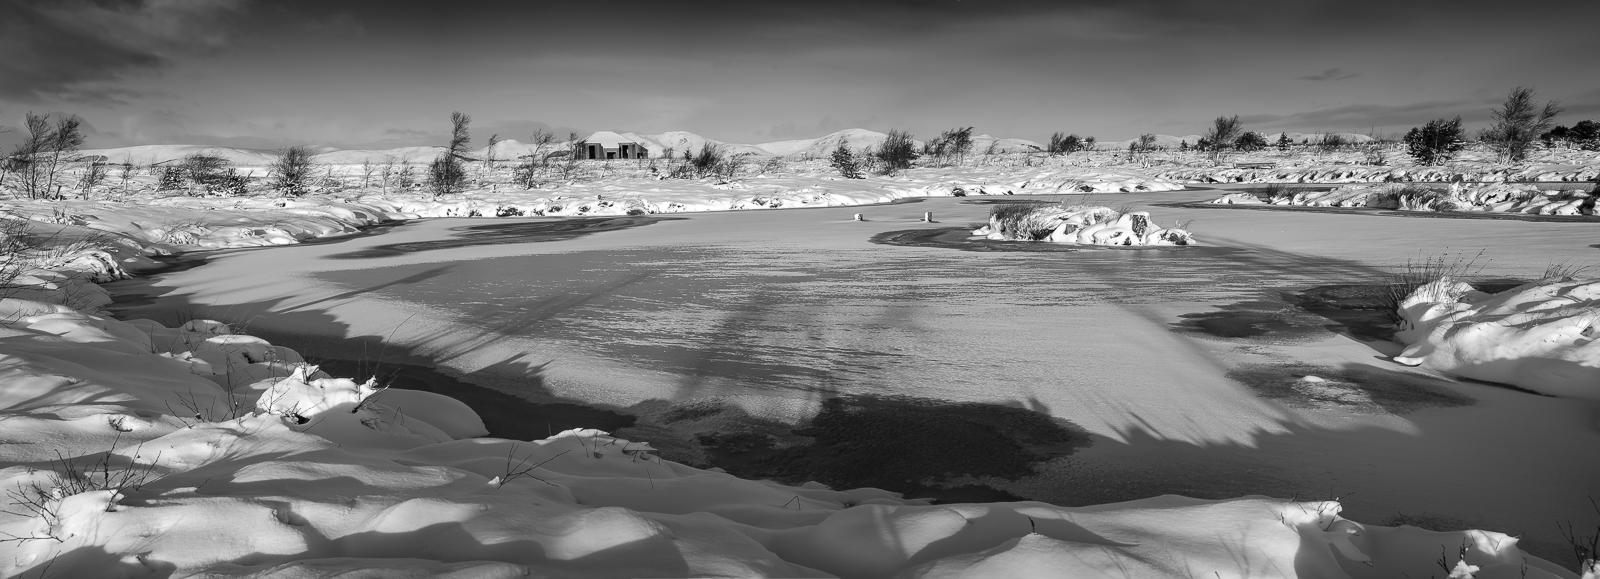 SnowScape Panoramic.JPG.jpg